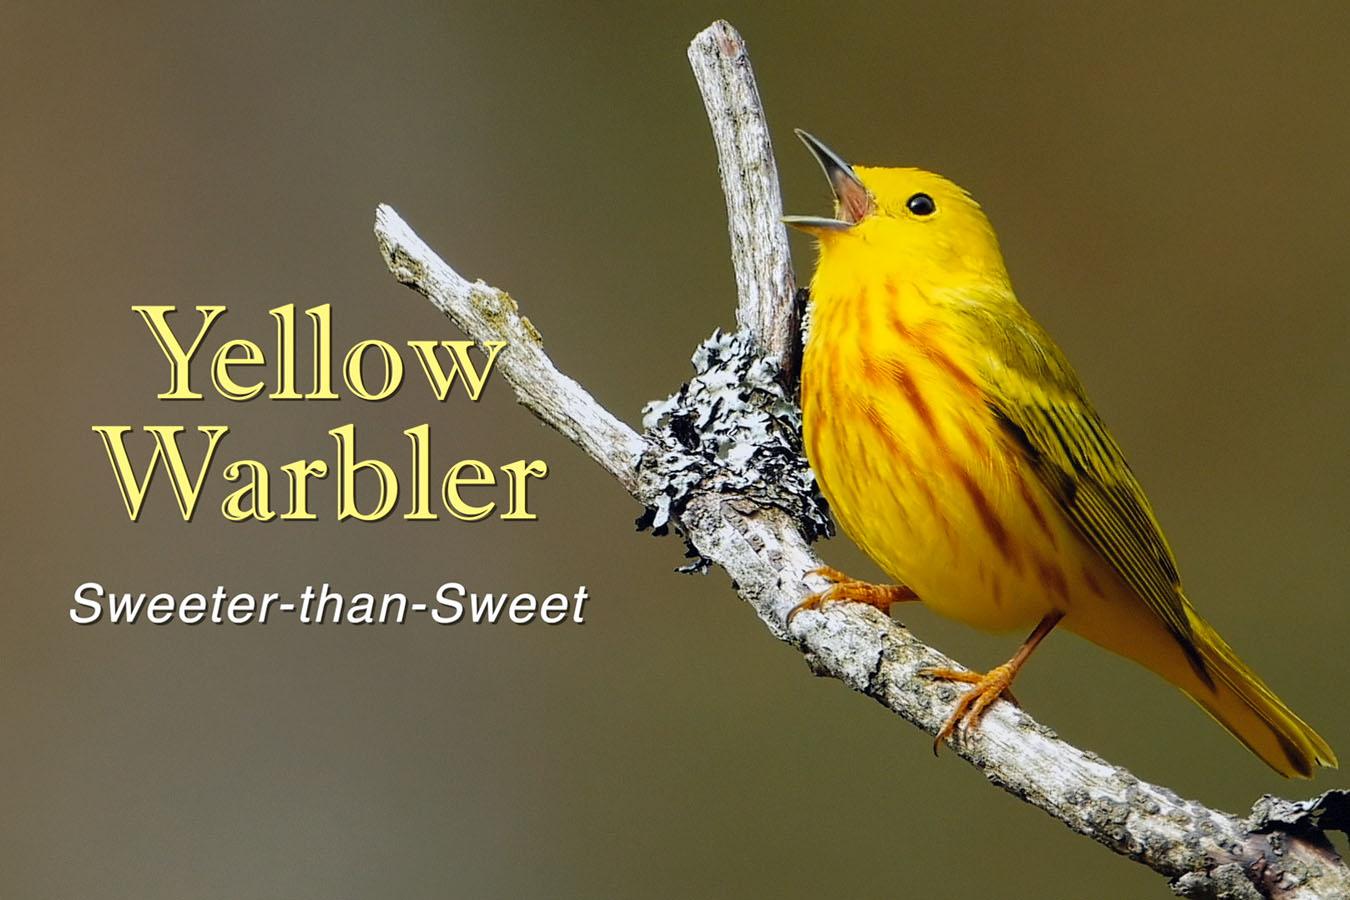 Yellow Warbler - featured image © Lang Elliott